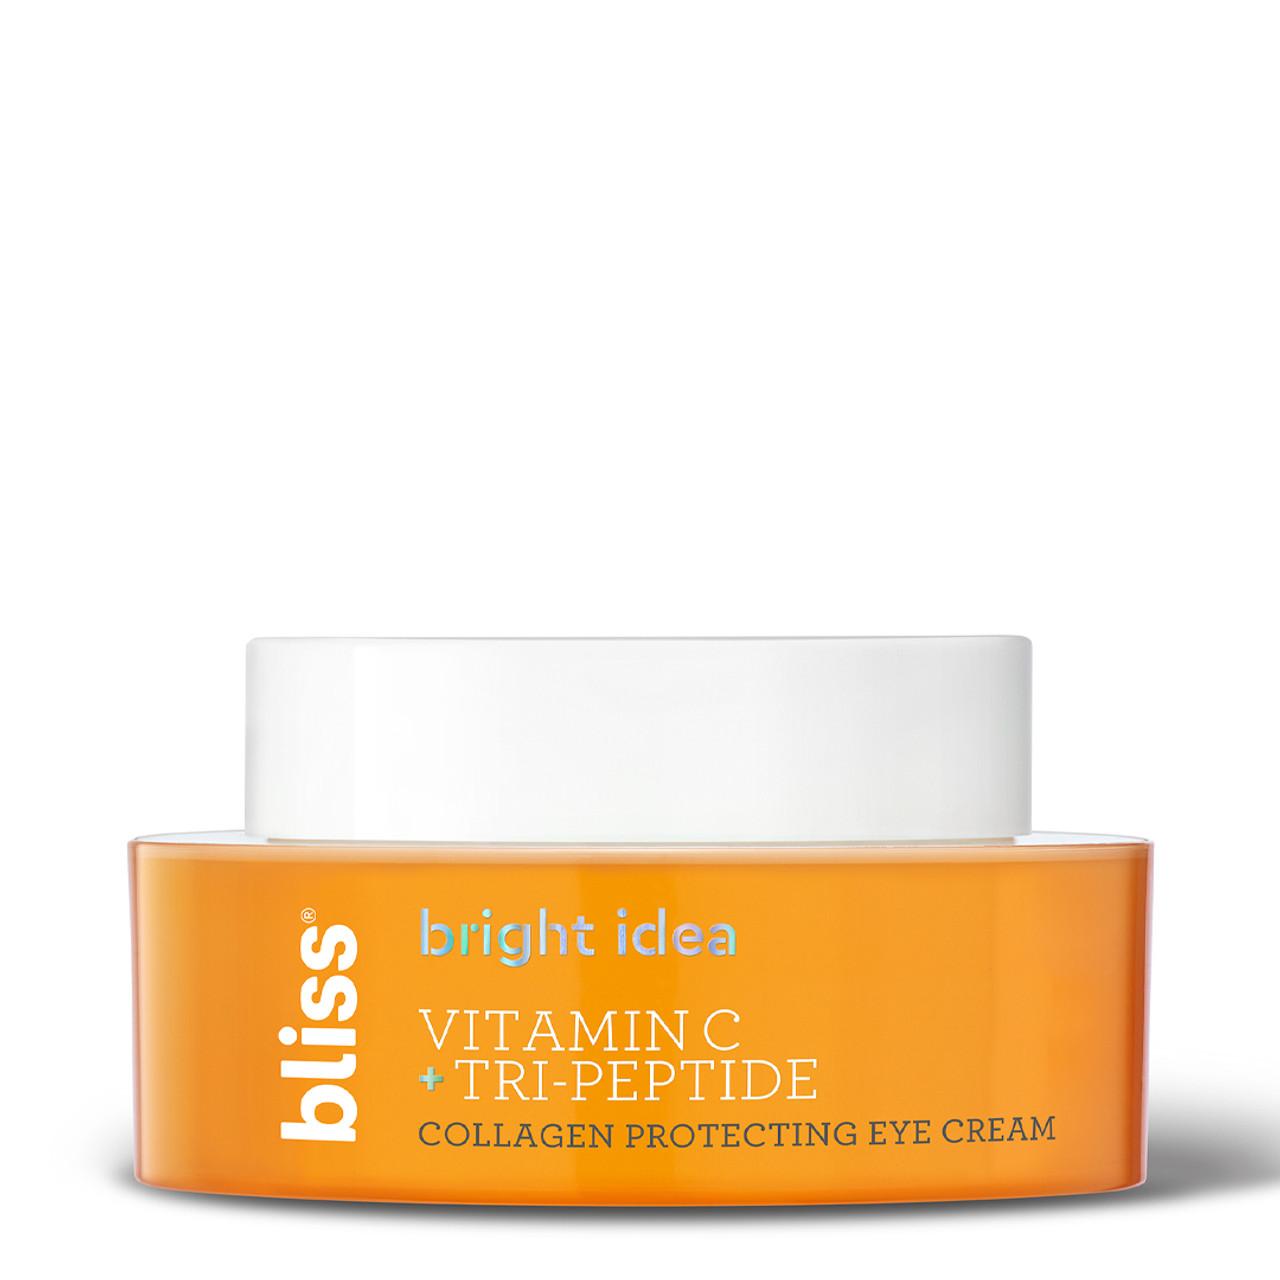 Bliss - Bright Idea Vitamin C Serum